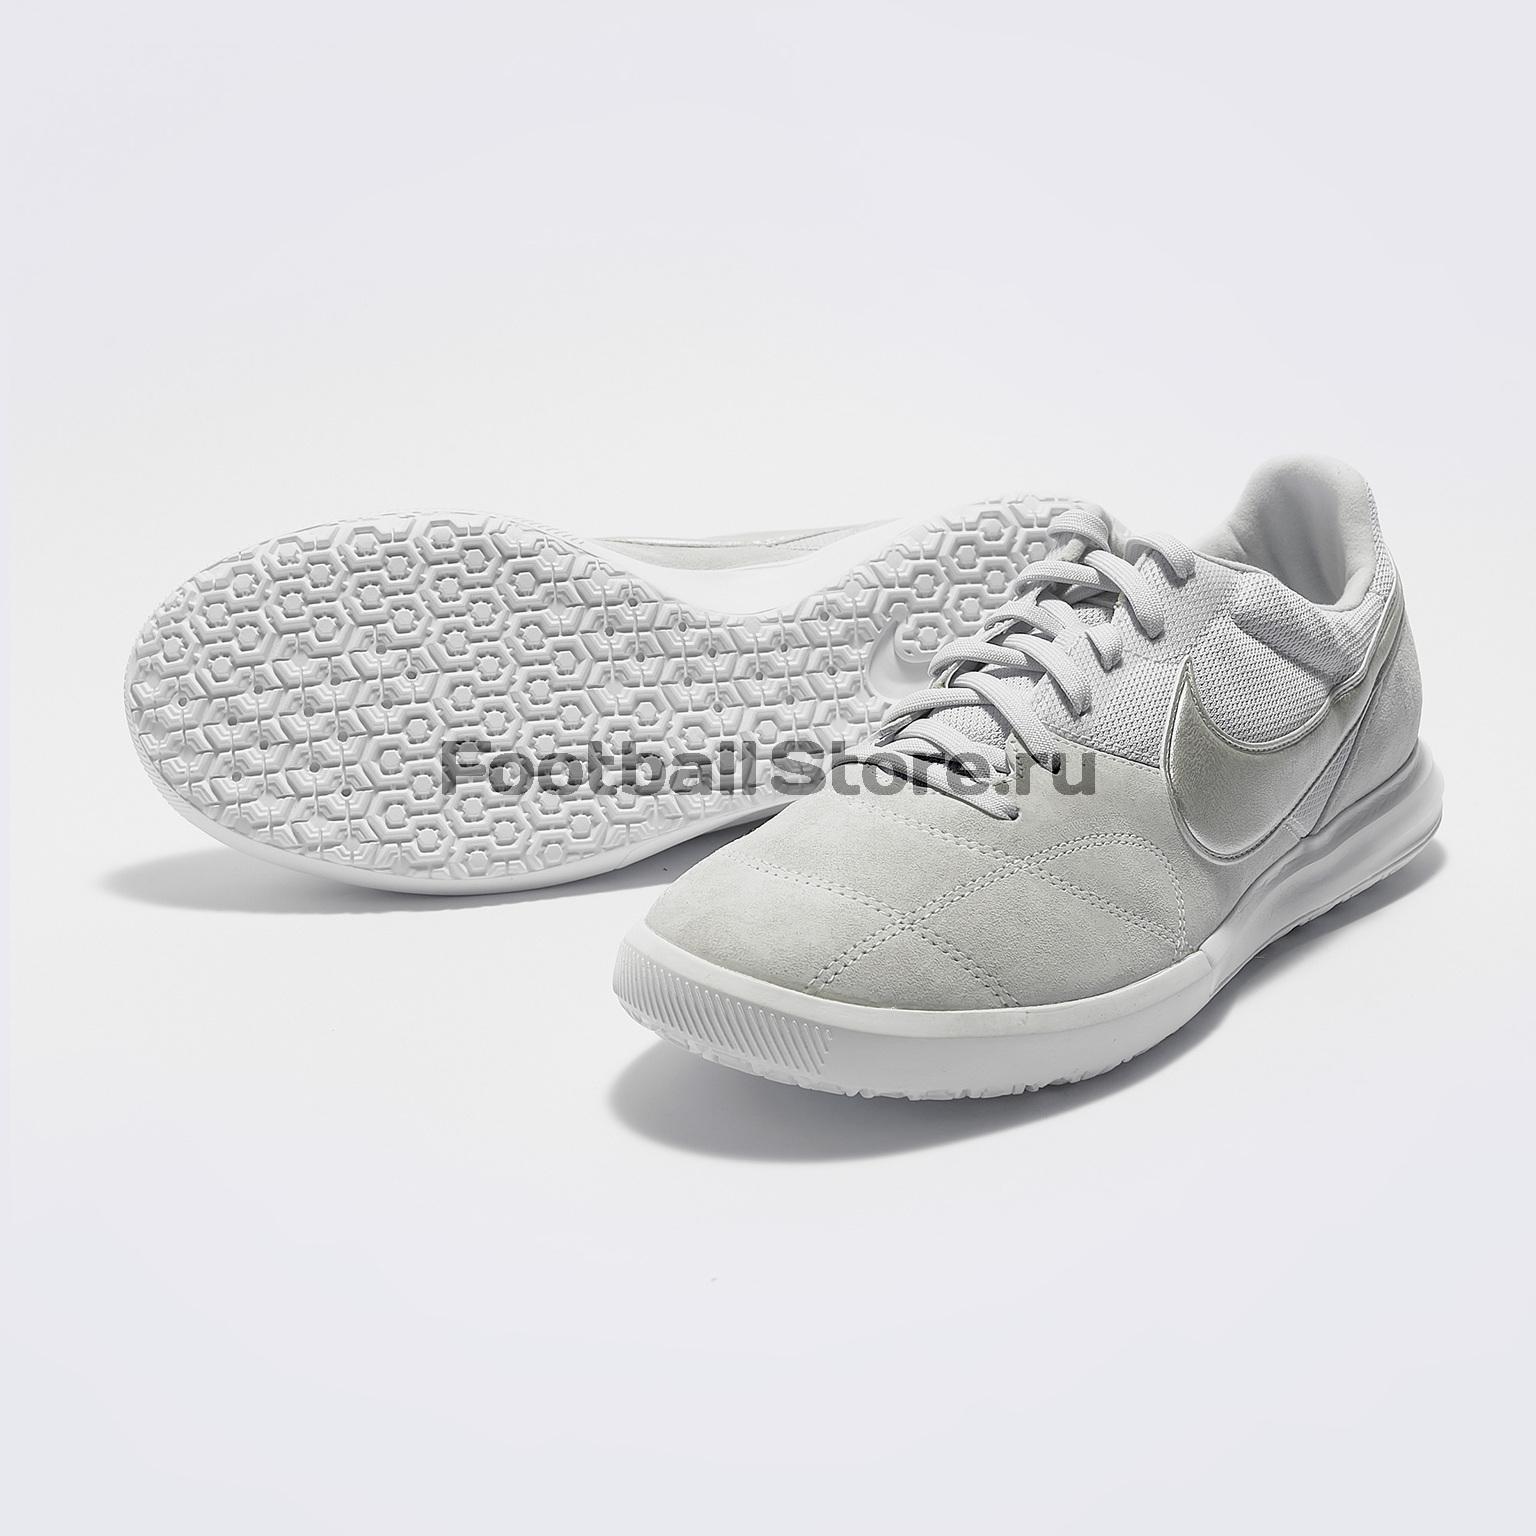 Футзалки Nike Tiempo Premier II Sala AV3153-002 недорго, оригинальная цена